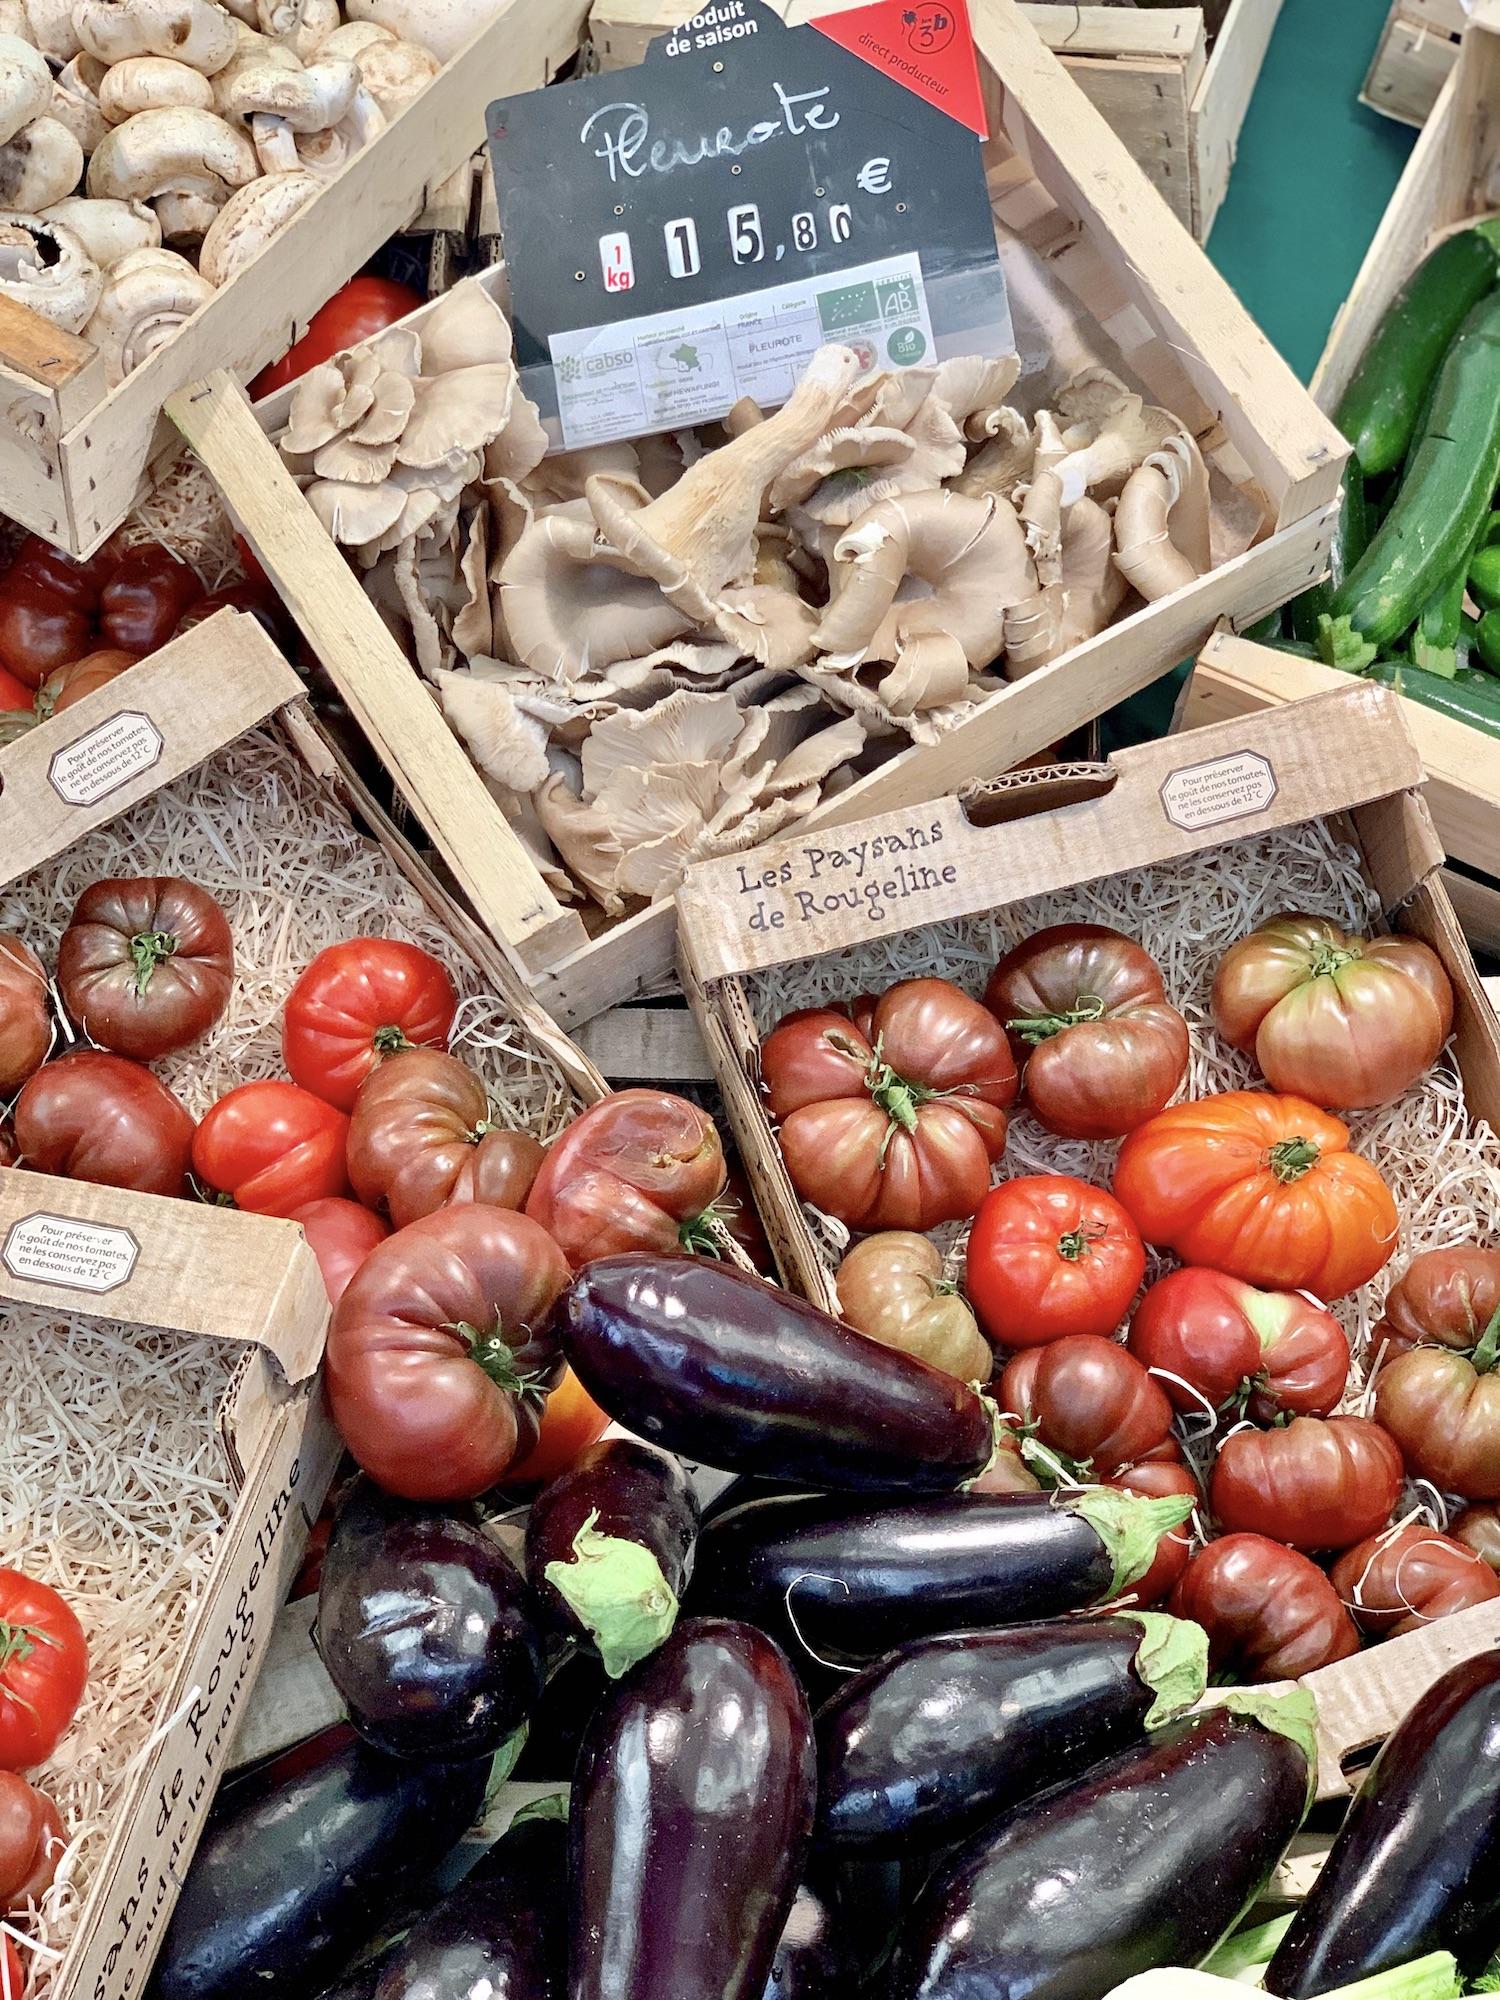 Organic marché Raspail produce